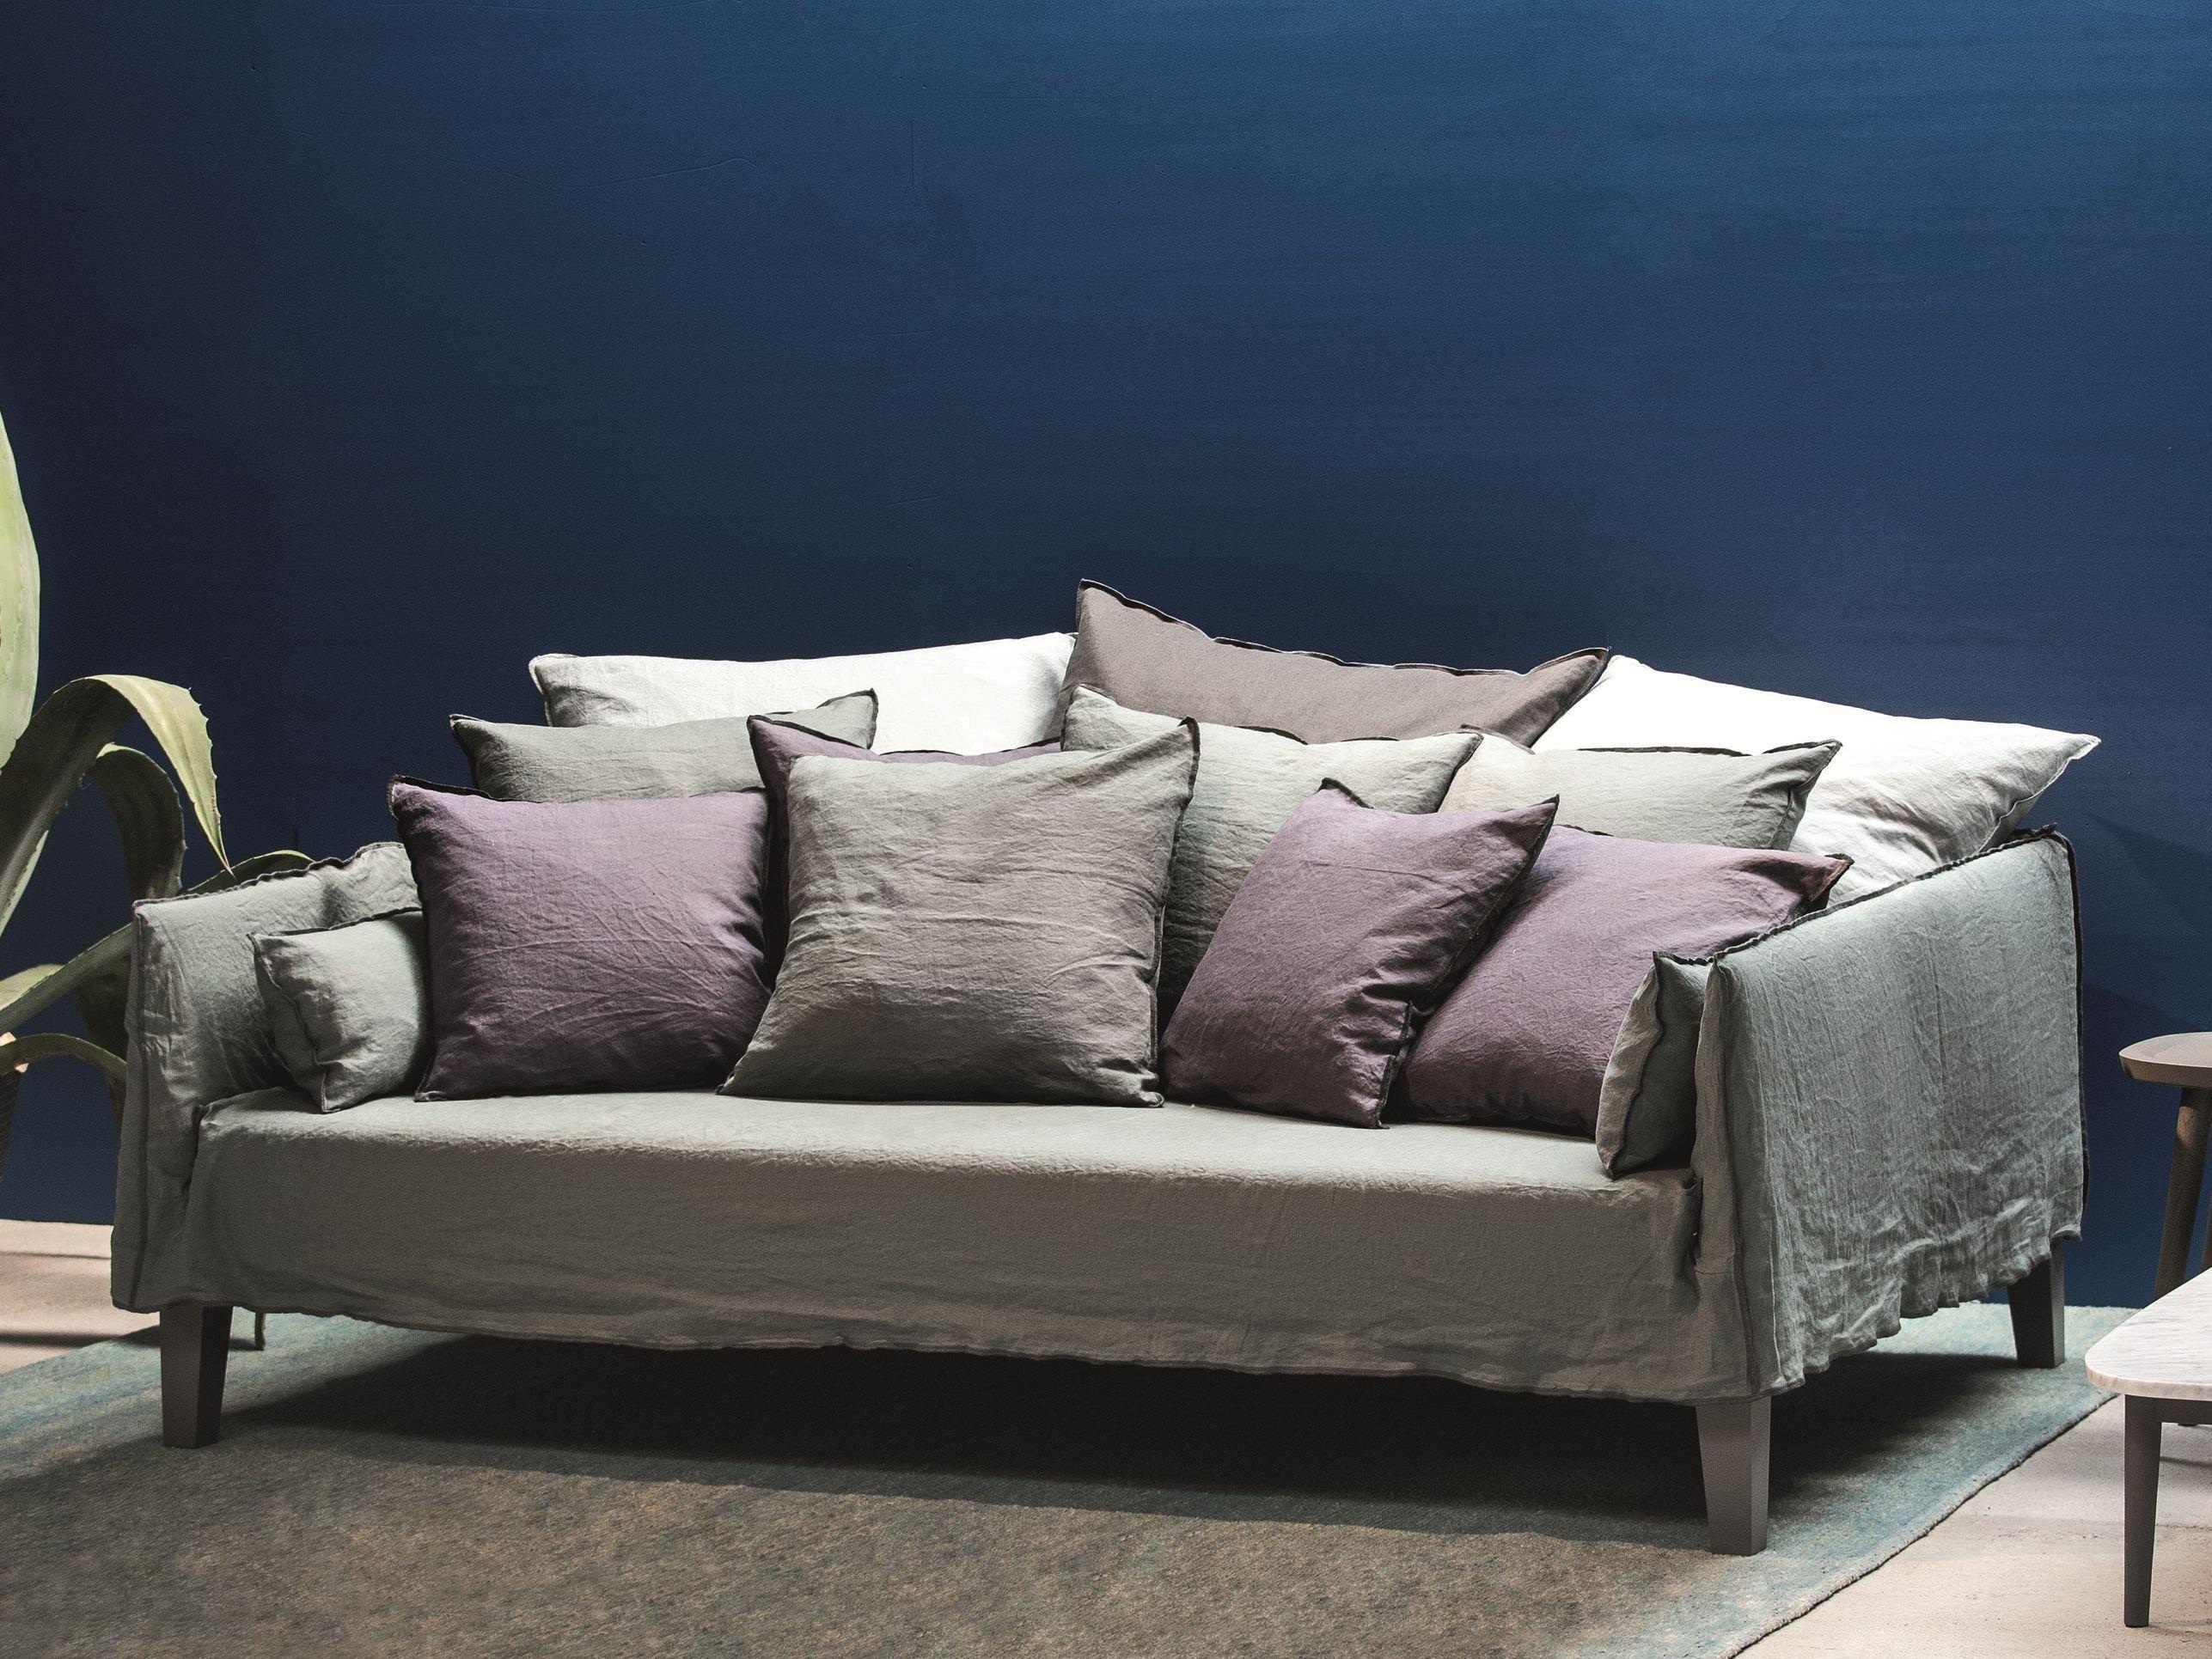 Tolle gervasoni sofa | Deutsche Deko | Pinterest